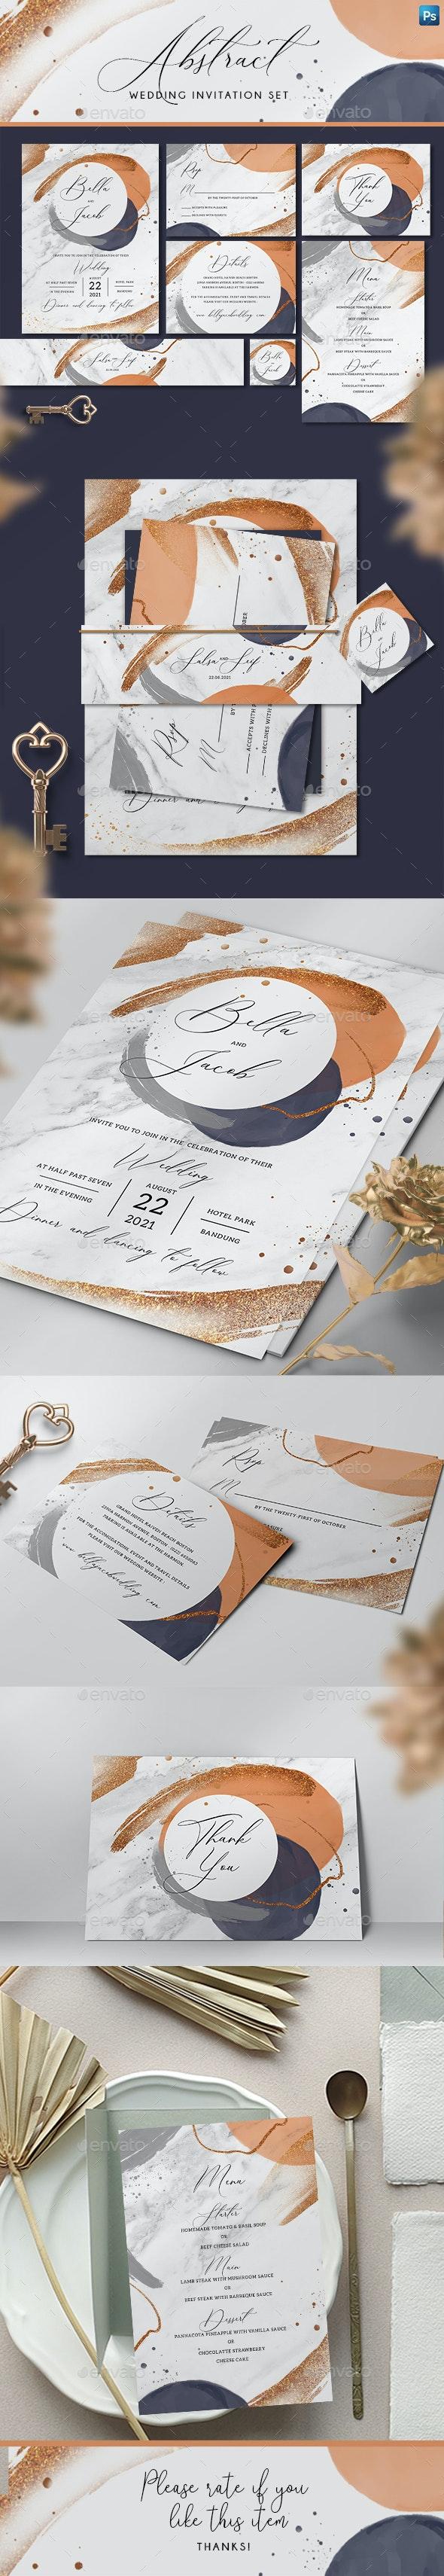 Abstract Wedding Invitation Set - Invitations Cards & Invites